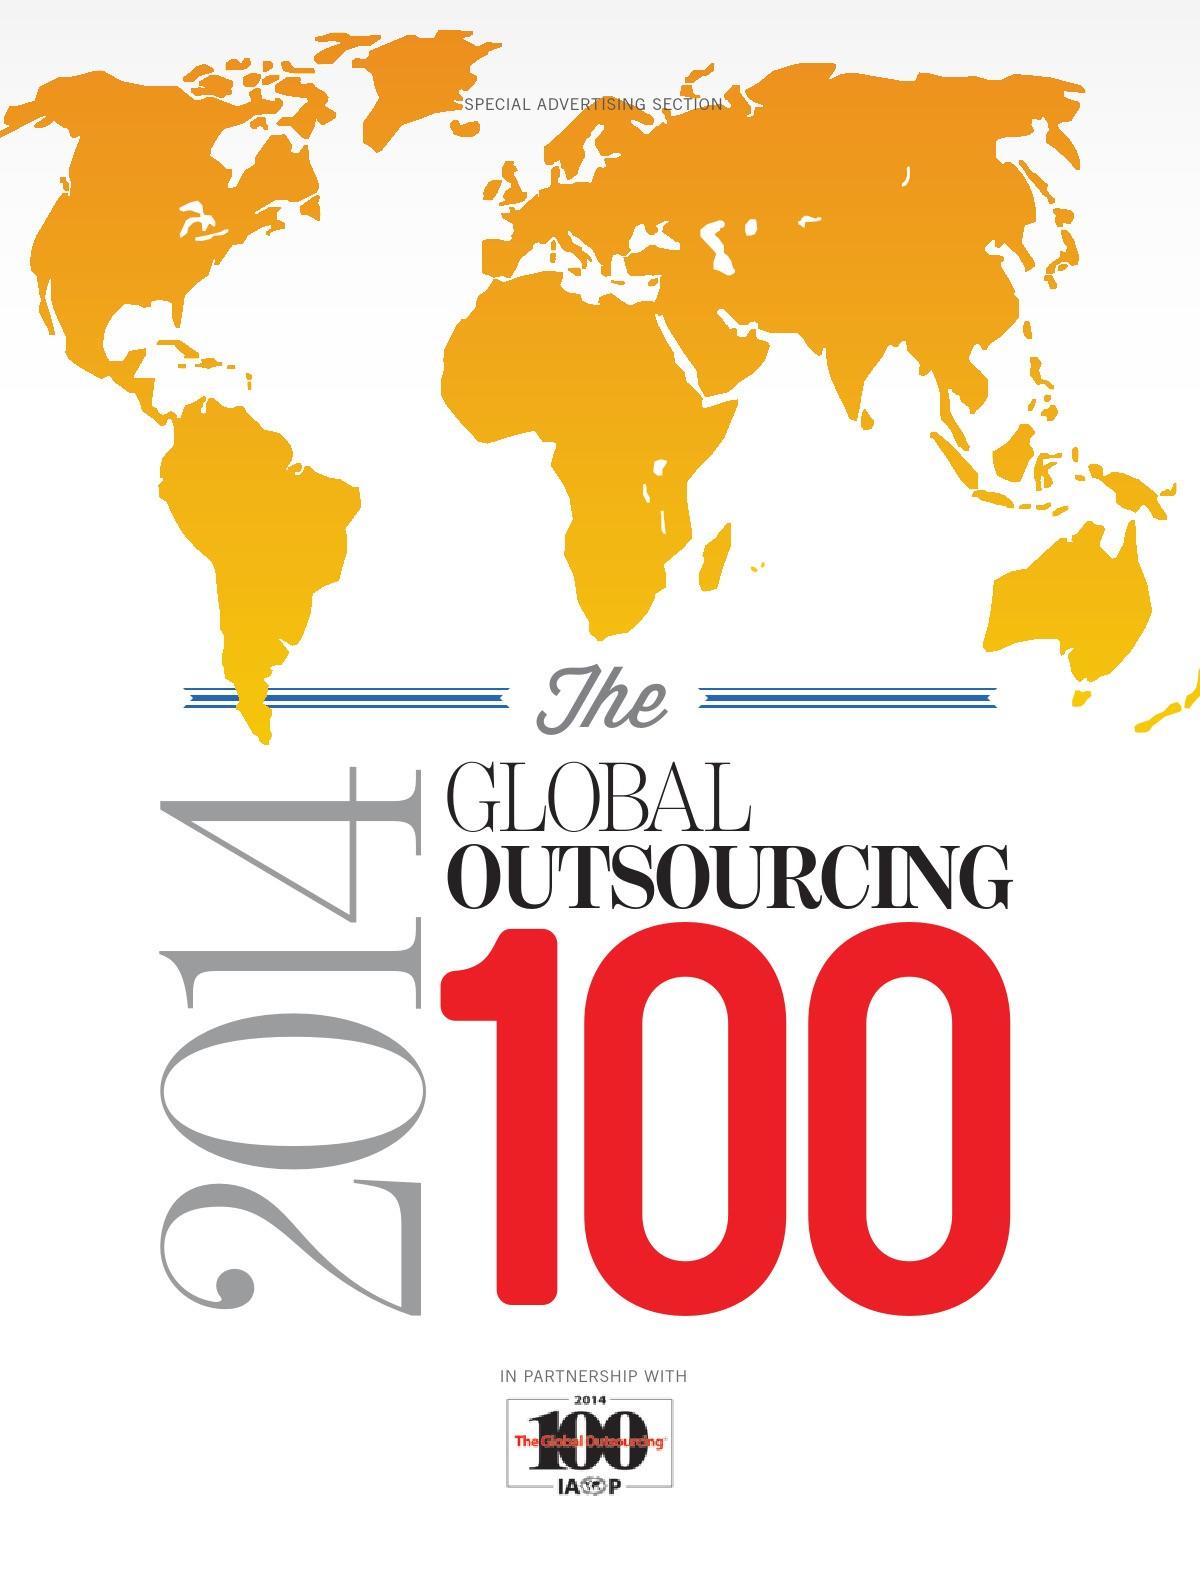 descri global outsourcing association - 638×838